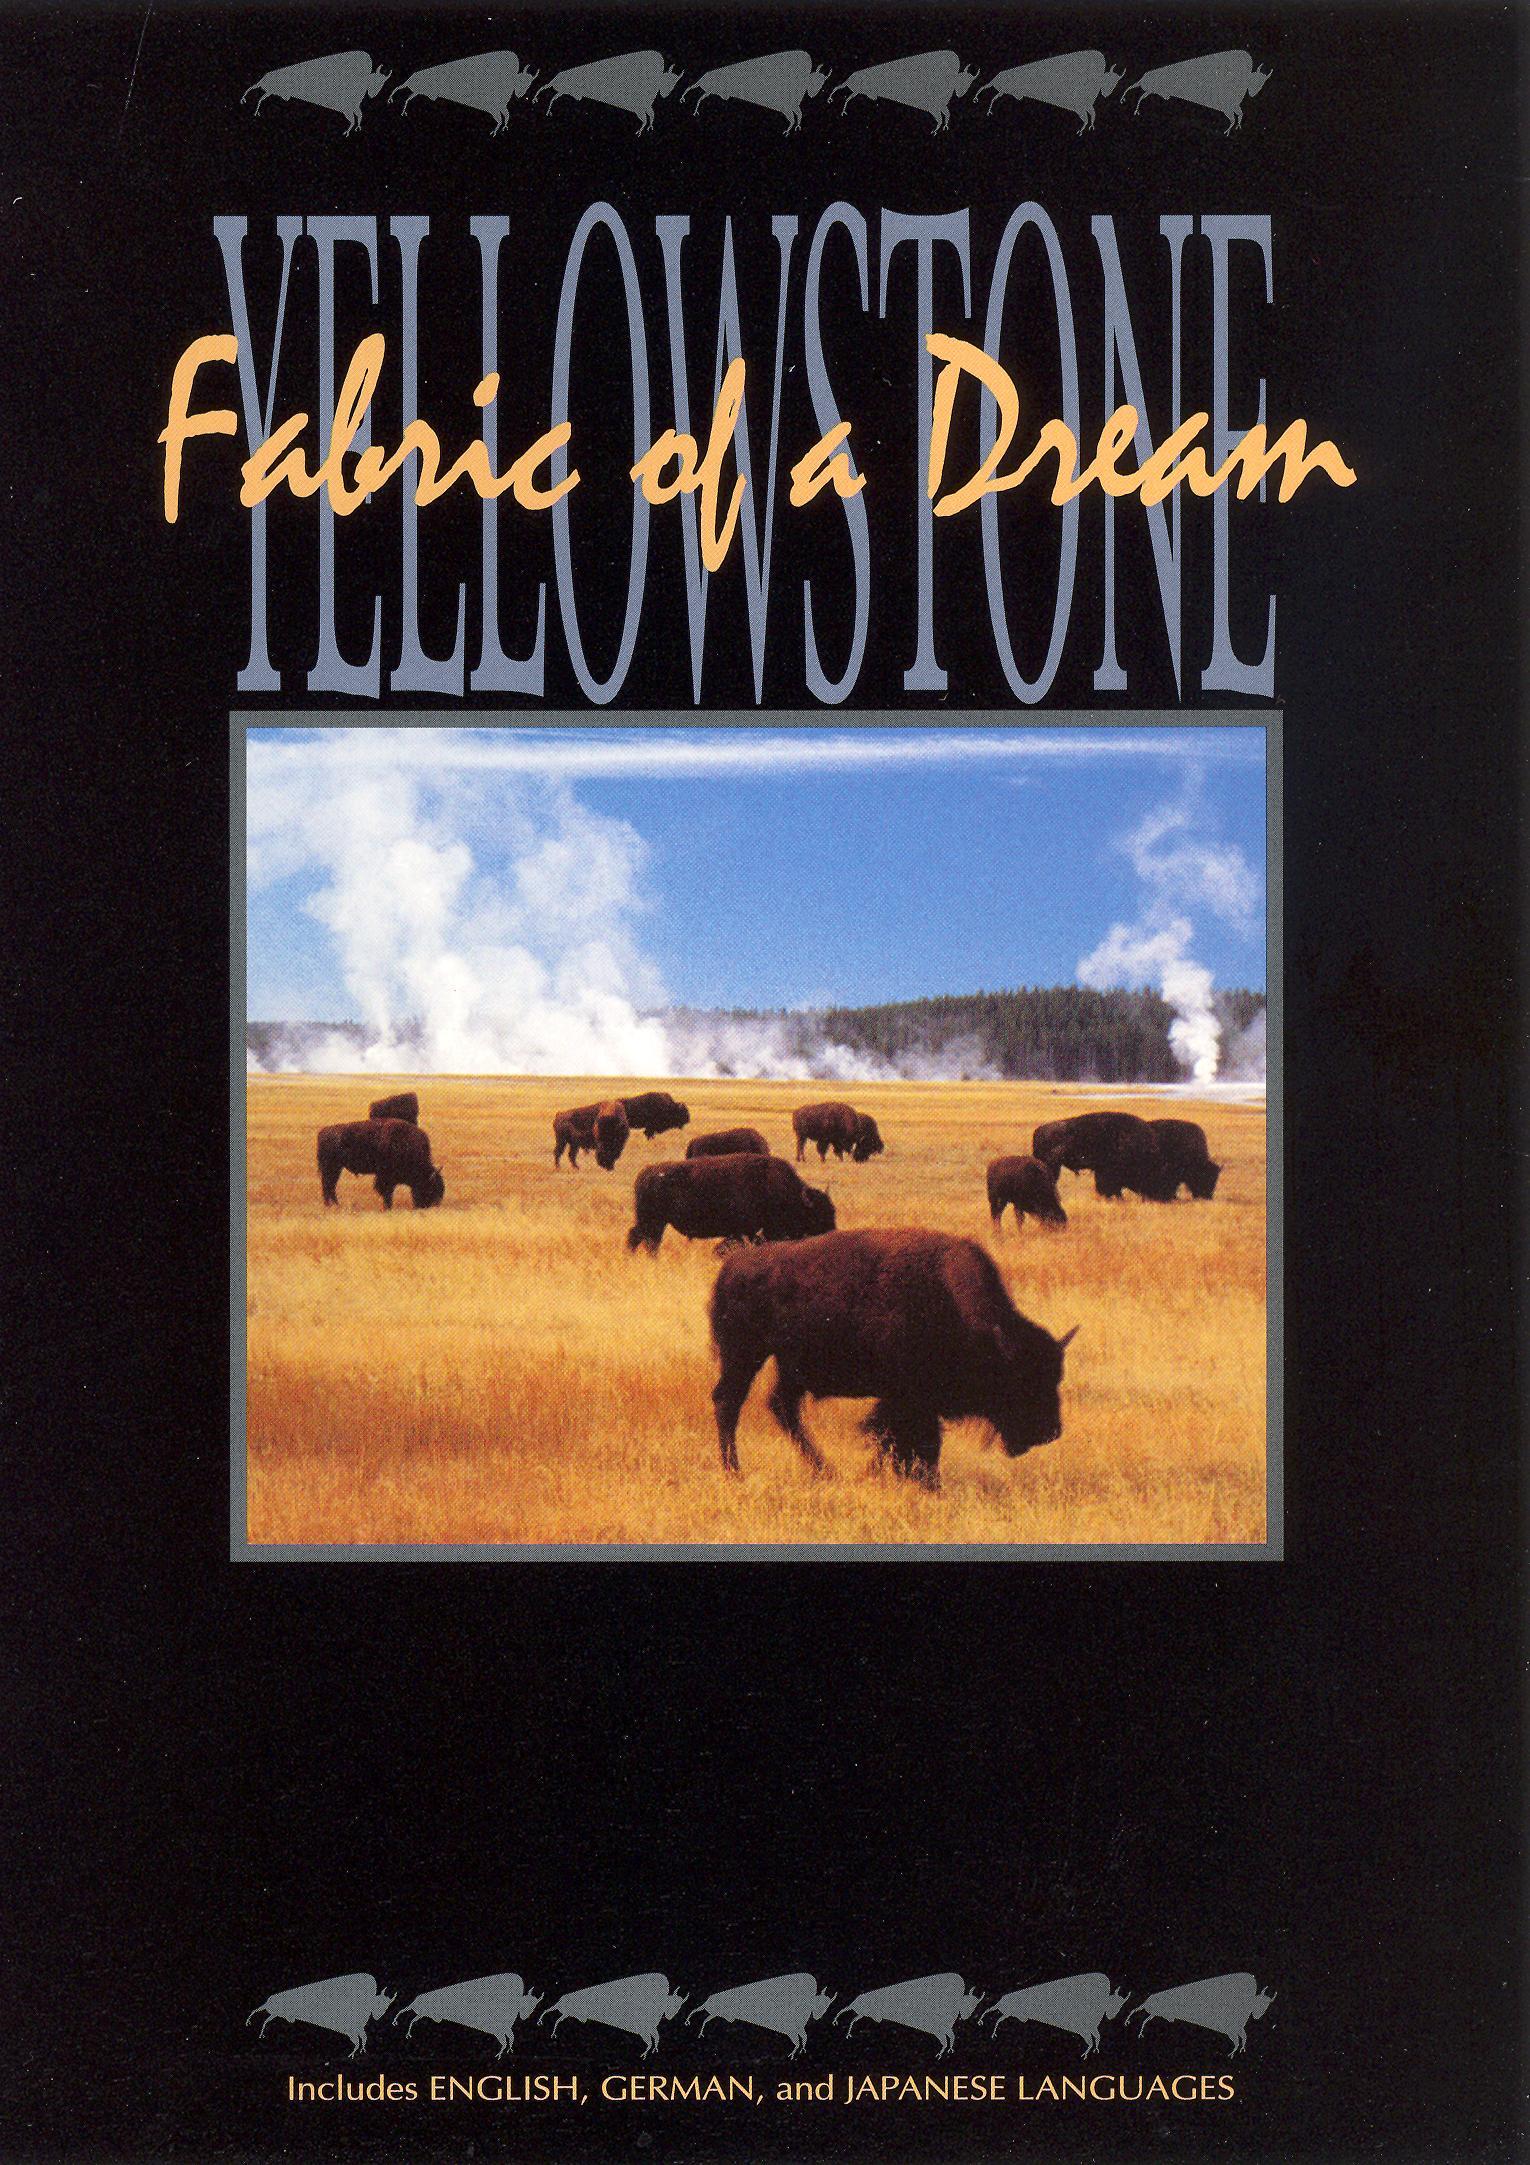 Yellowstone: Fabric of a Dream